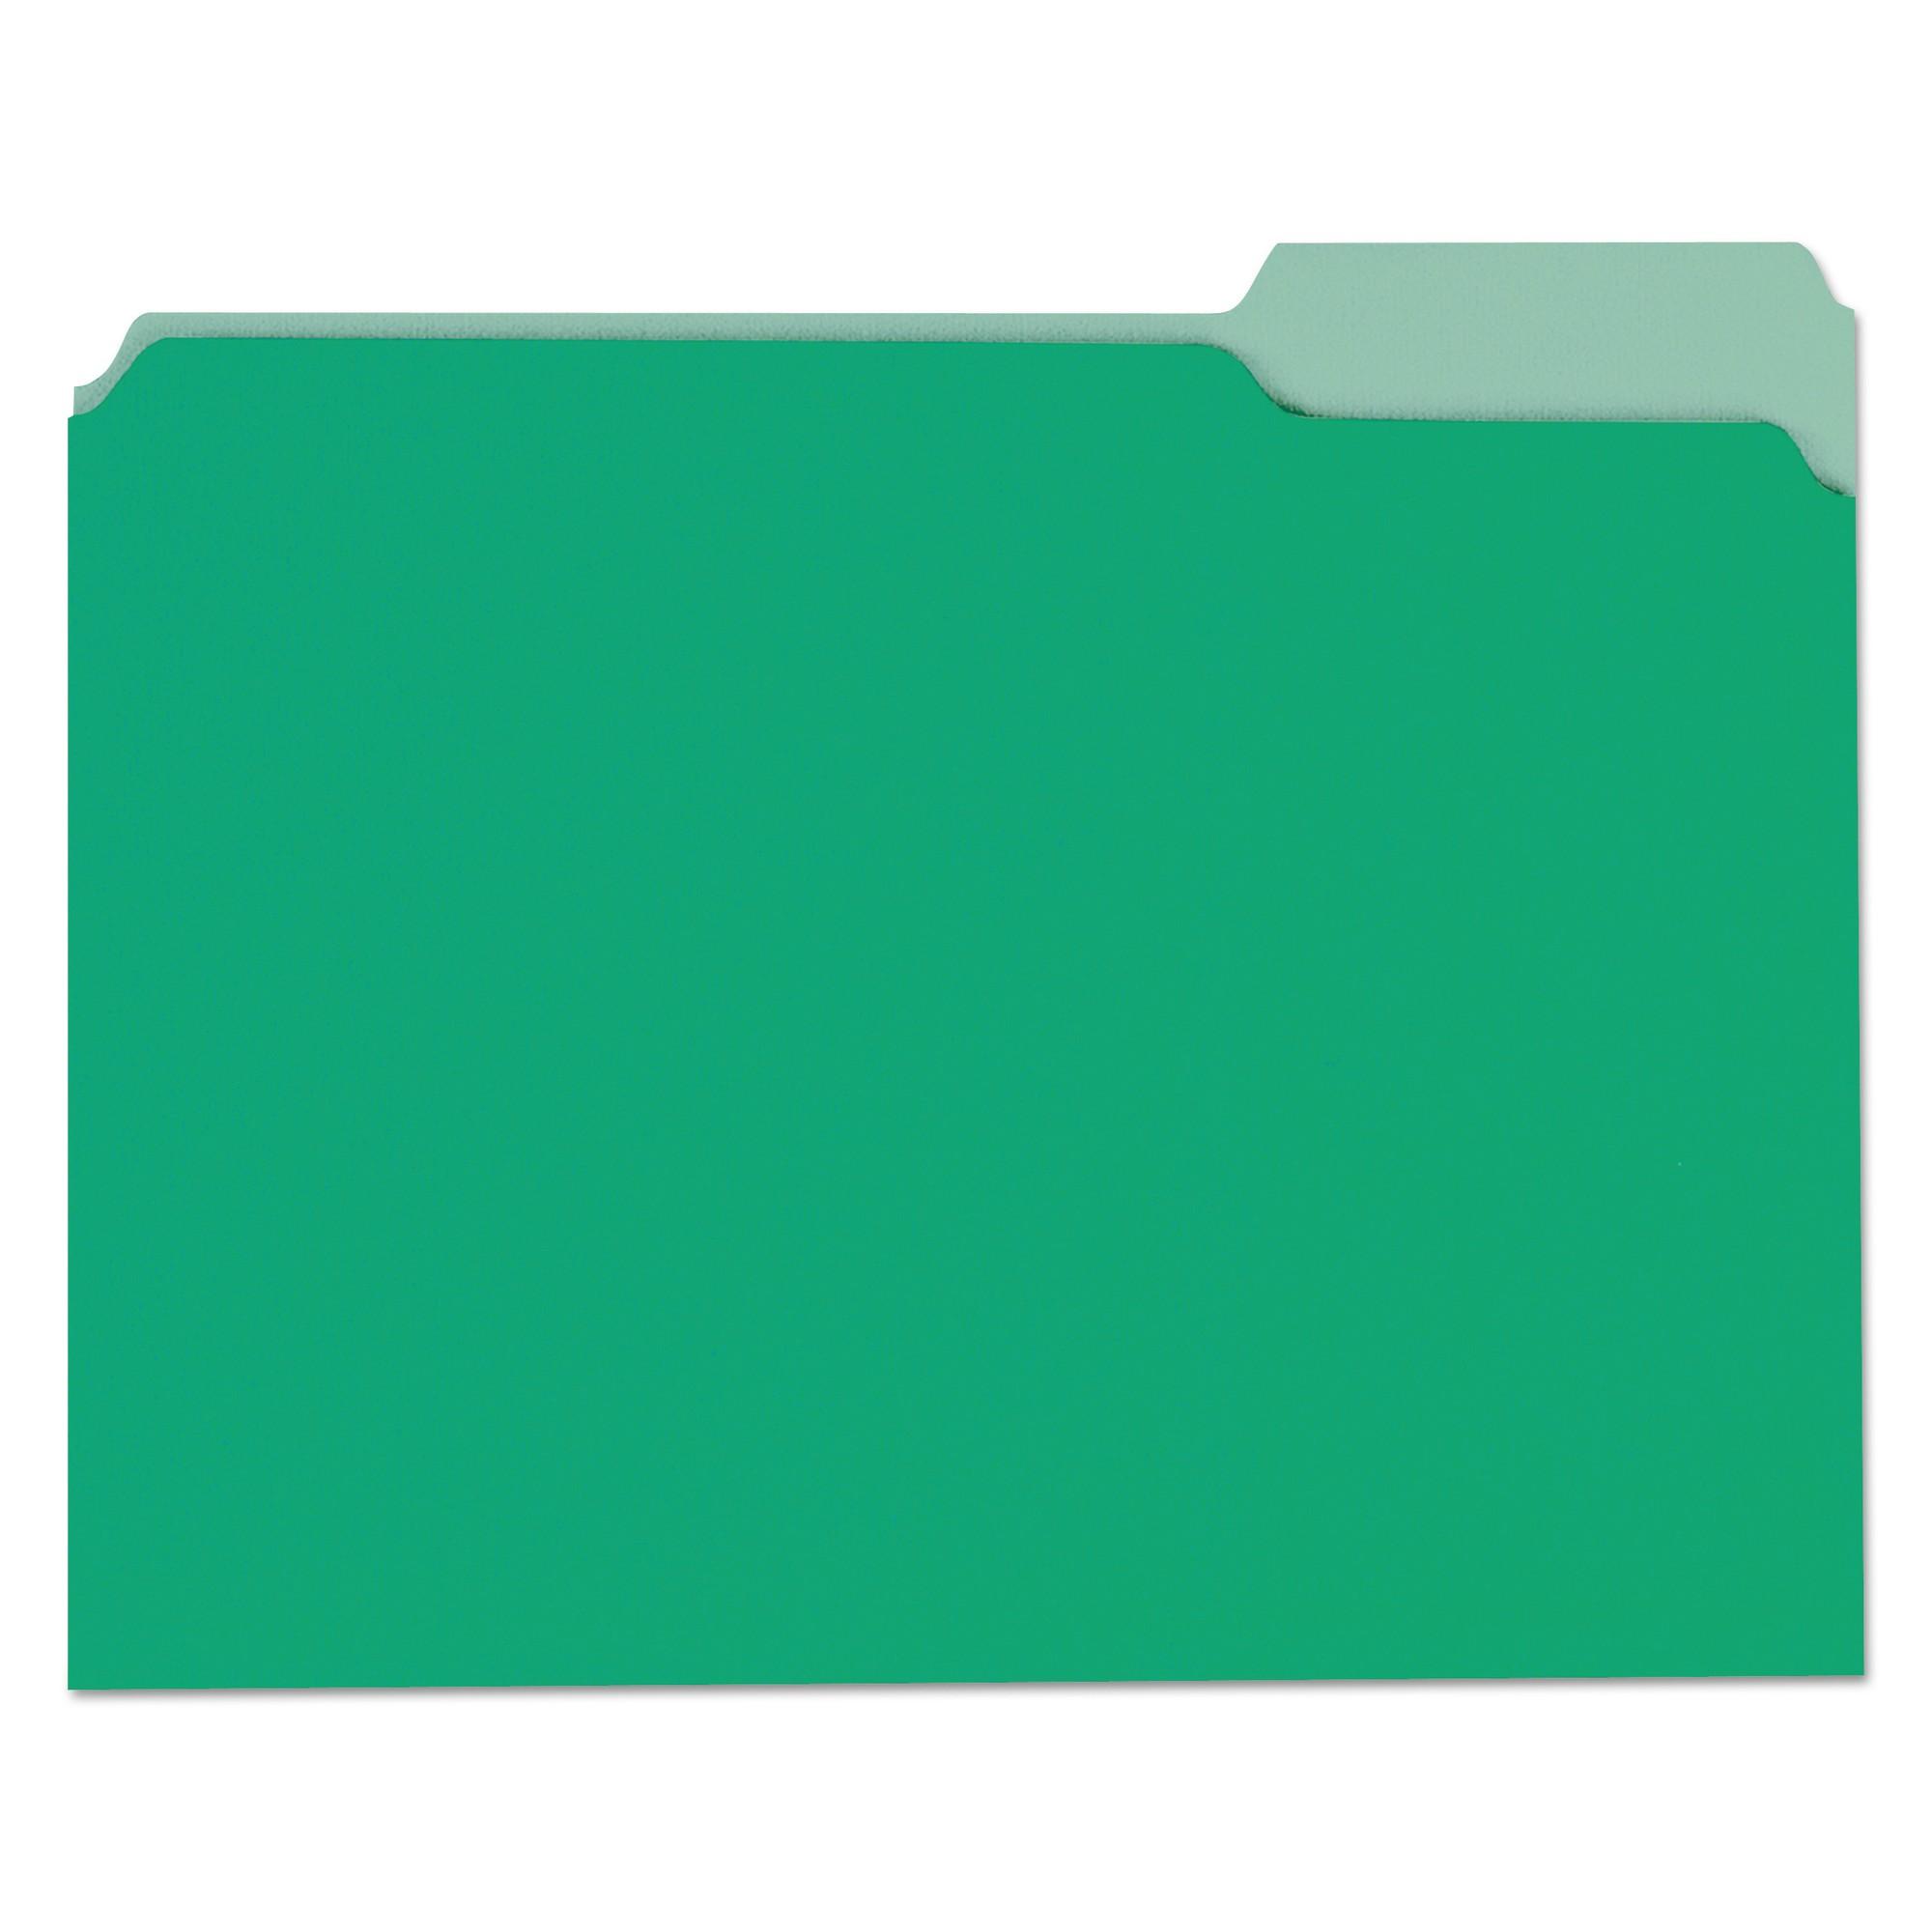 File Folders, 1/3 Cut One-Ply Tab, Letter, Green/Light Green, 100/Box